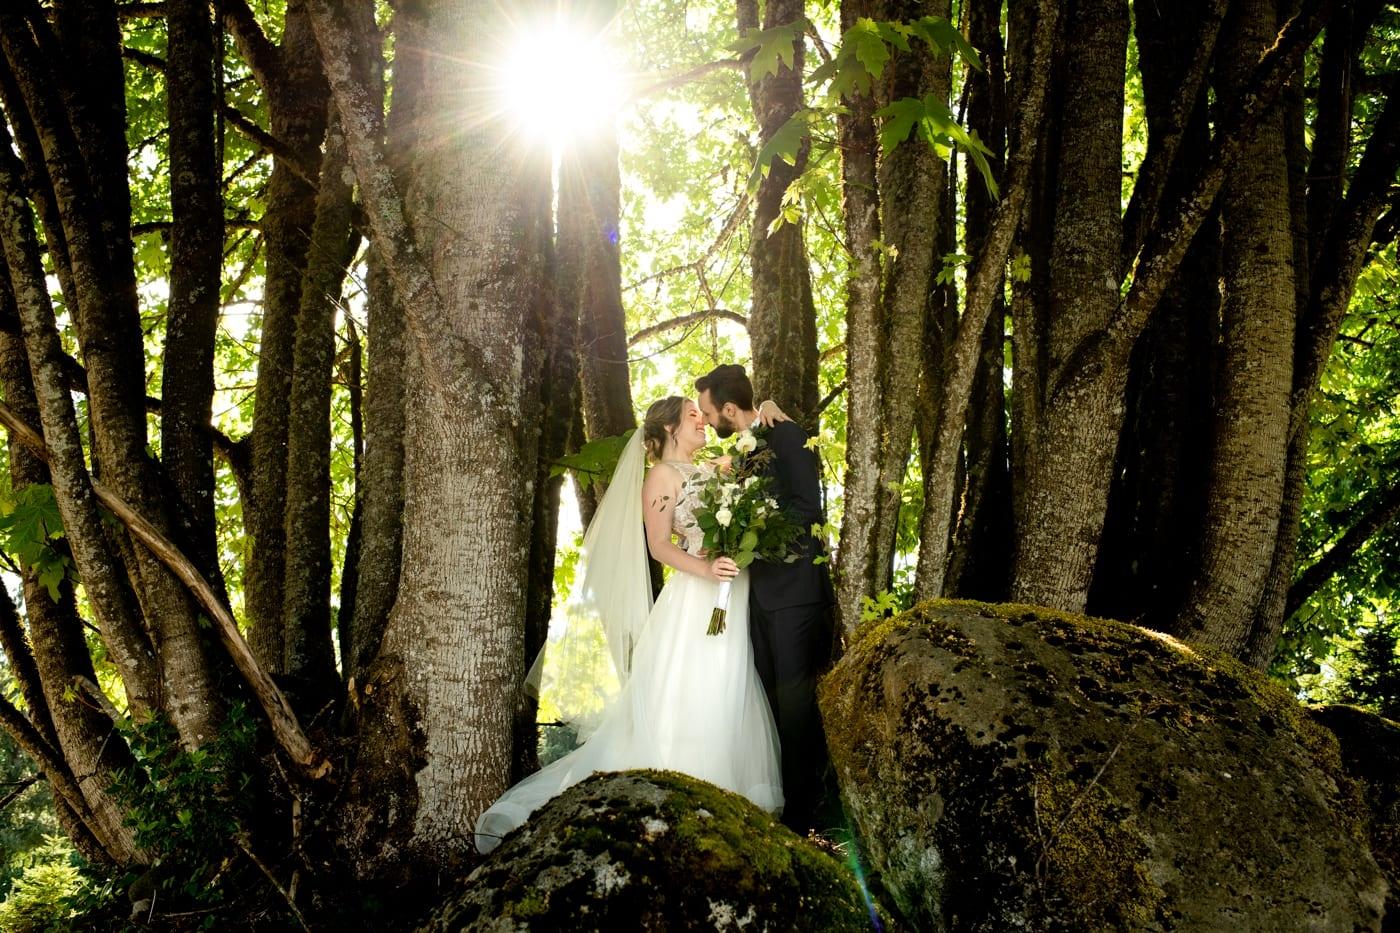 Just-Married-Couple-Trinity-Tree-Farm-Wedding-Photos-Greener-Visuals